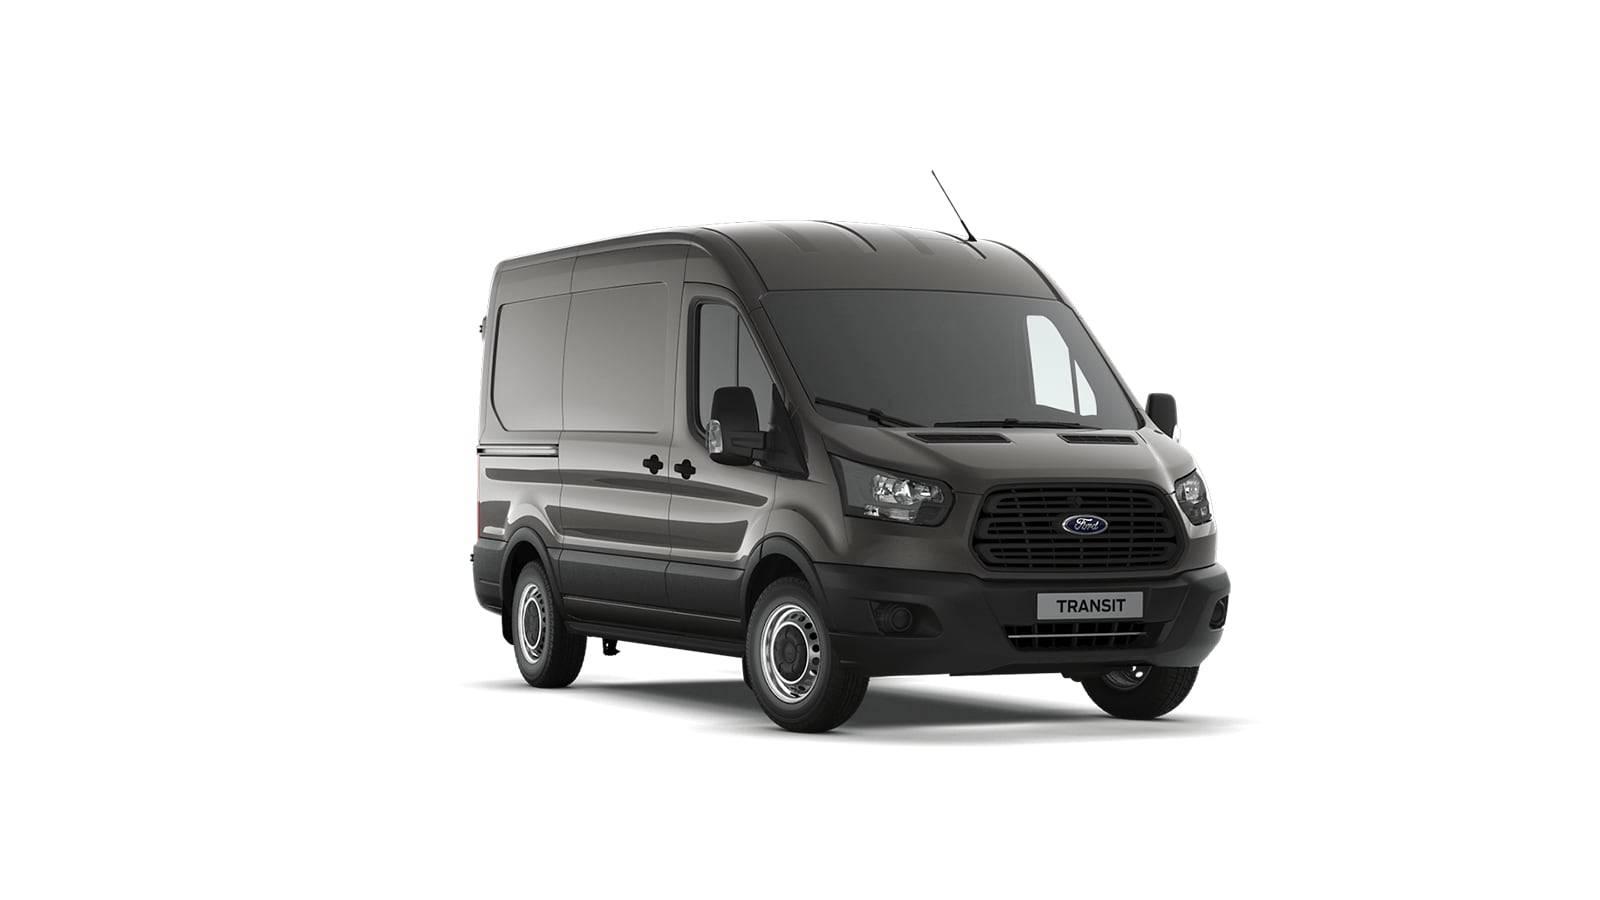 FORD TRANSIT 2.2 TDCI MT (125 л.с.) Грузовой фургон L2H2 Переднеприводный фургон (310 L2 H2)